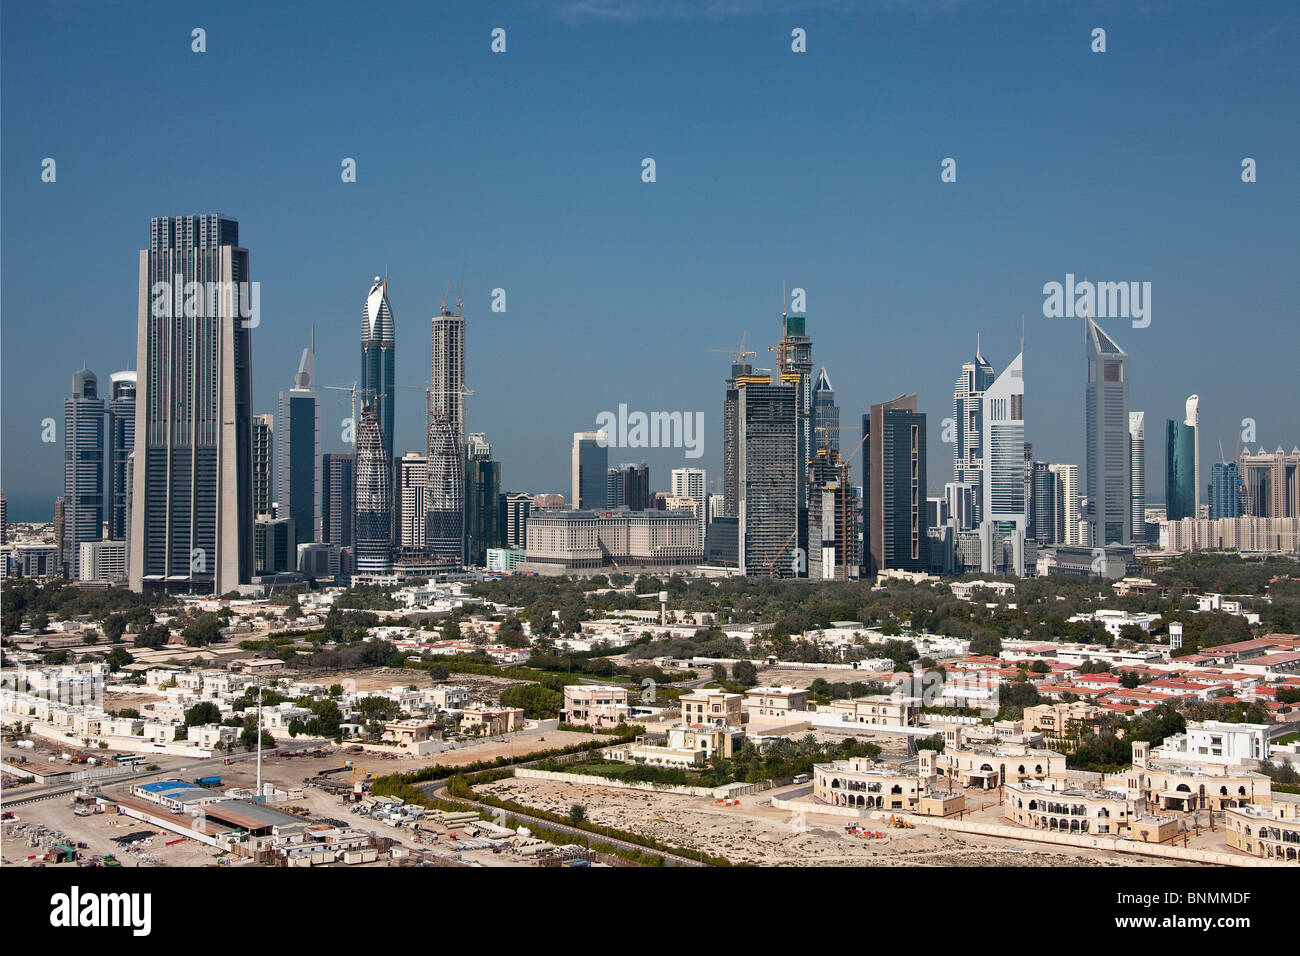 Dubai United Arab Emirates Middle East UAE Middle East skyline blocks of flats high-rise buildings buildings constructions - Stock Image